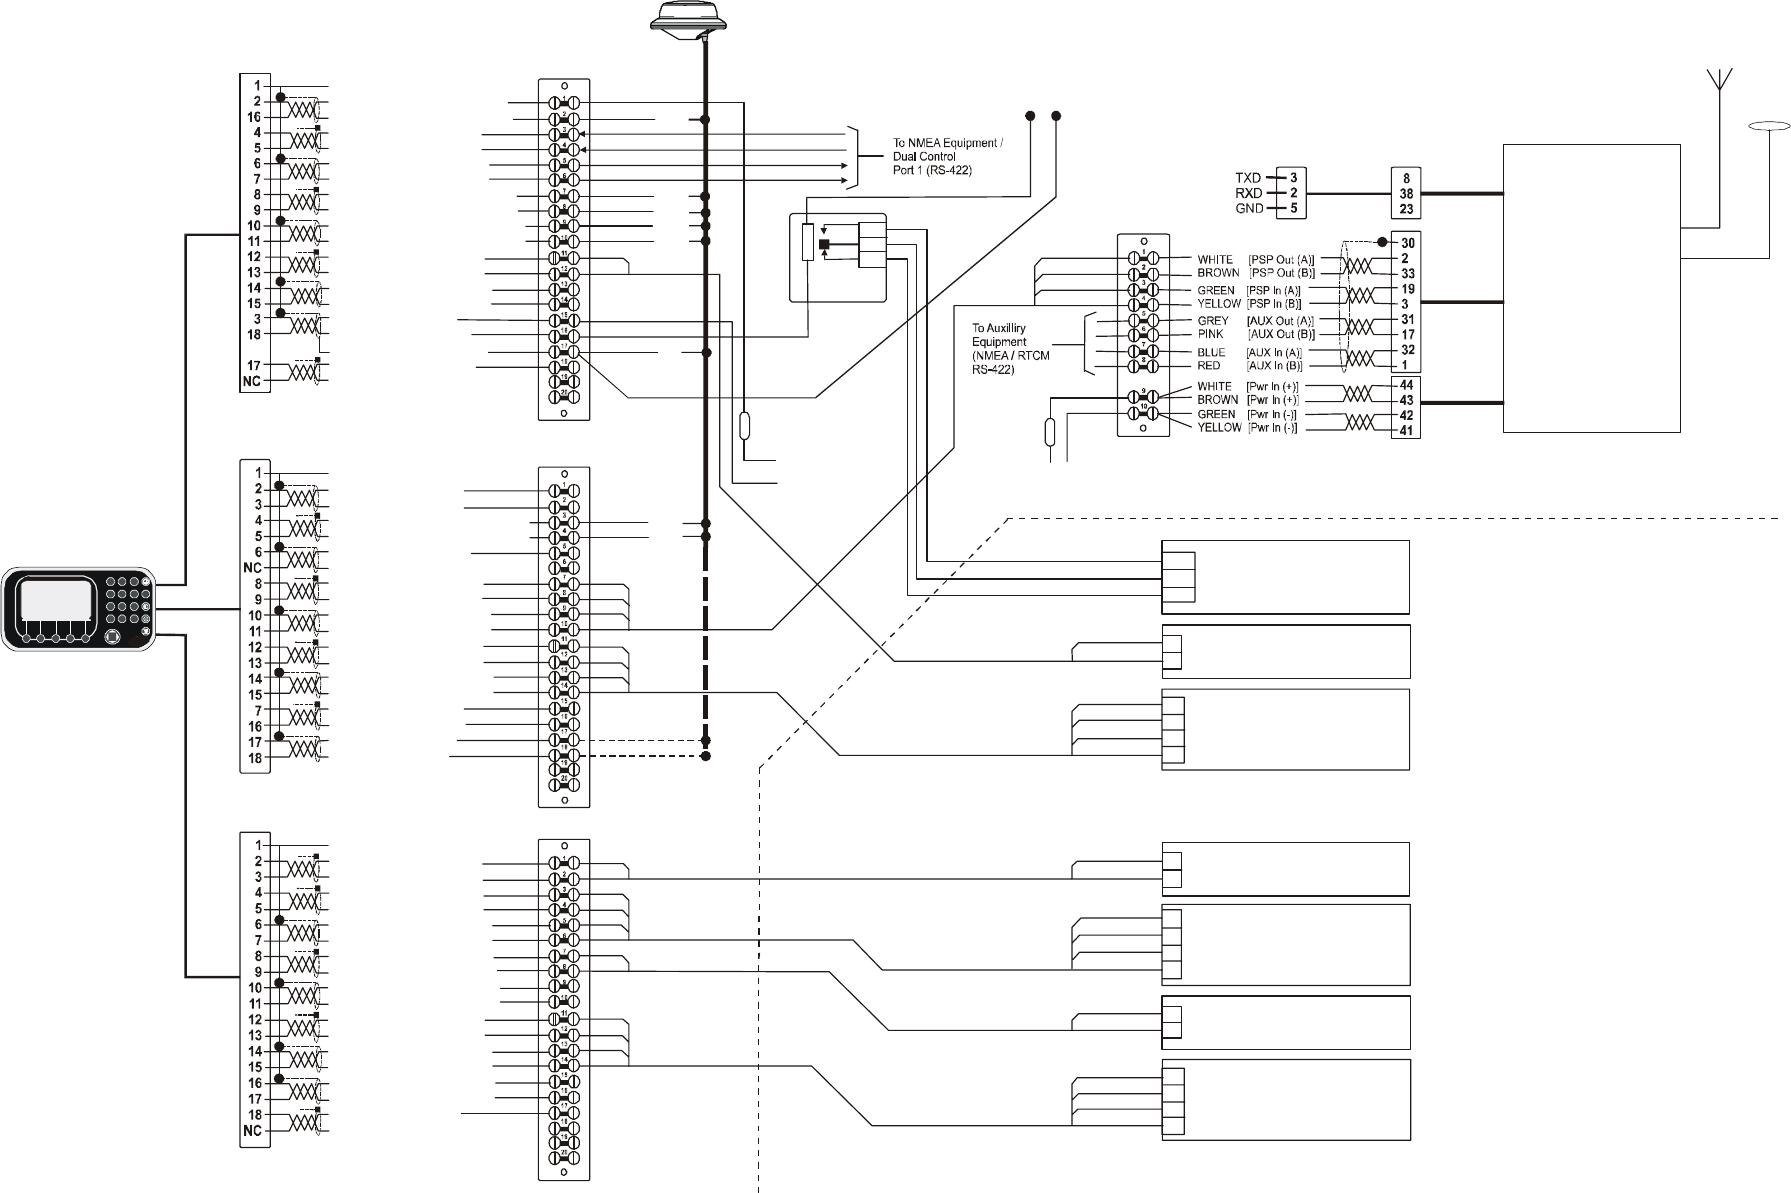 MX420_frntcvr_navico.p65 SMART 727027 MX420 Install Manual